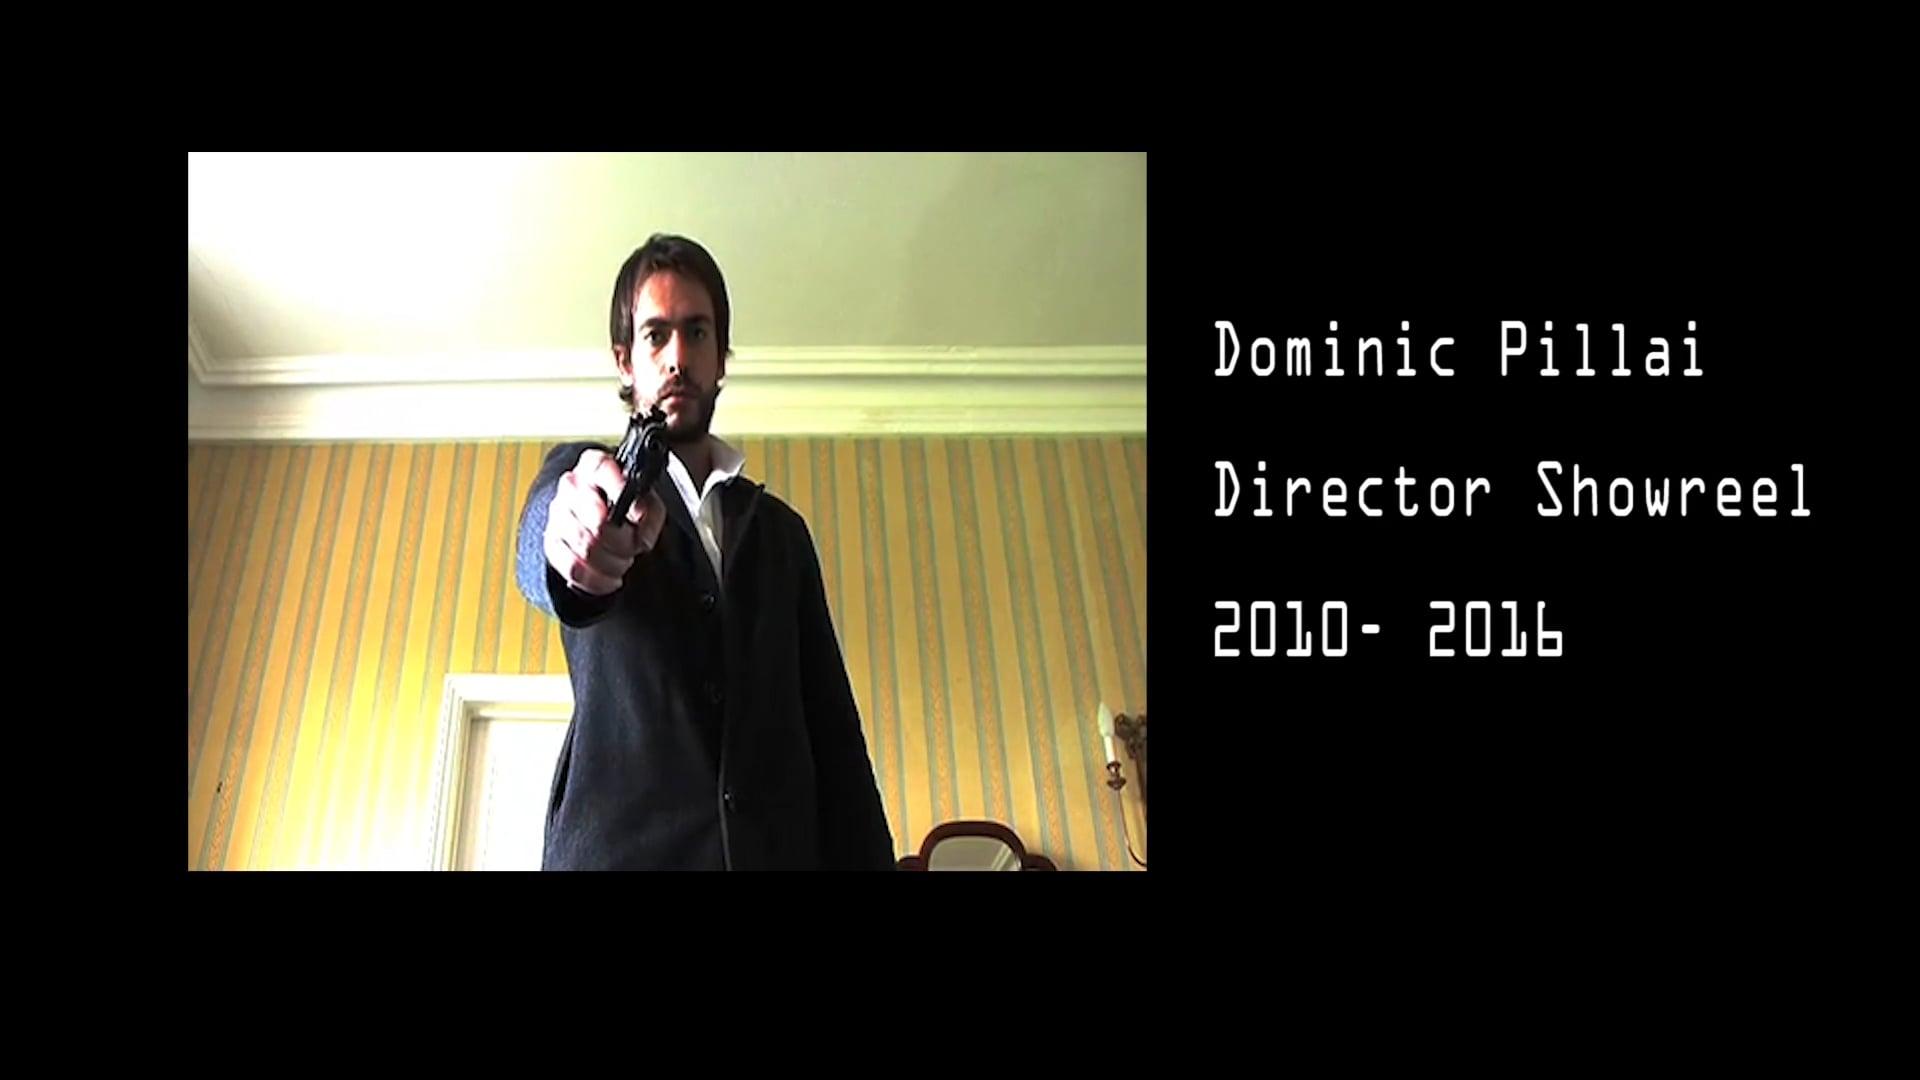 Dominic Pillai: Director Showreel 2010- 2016